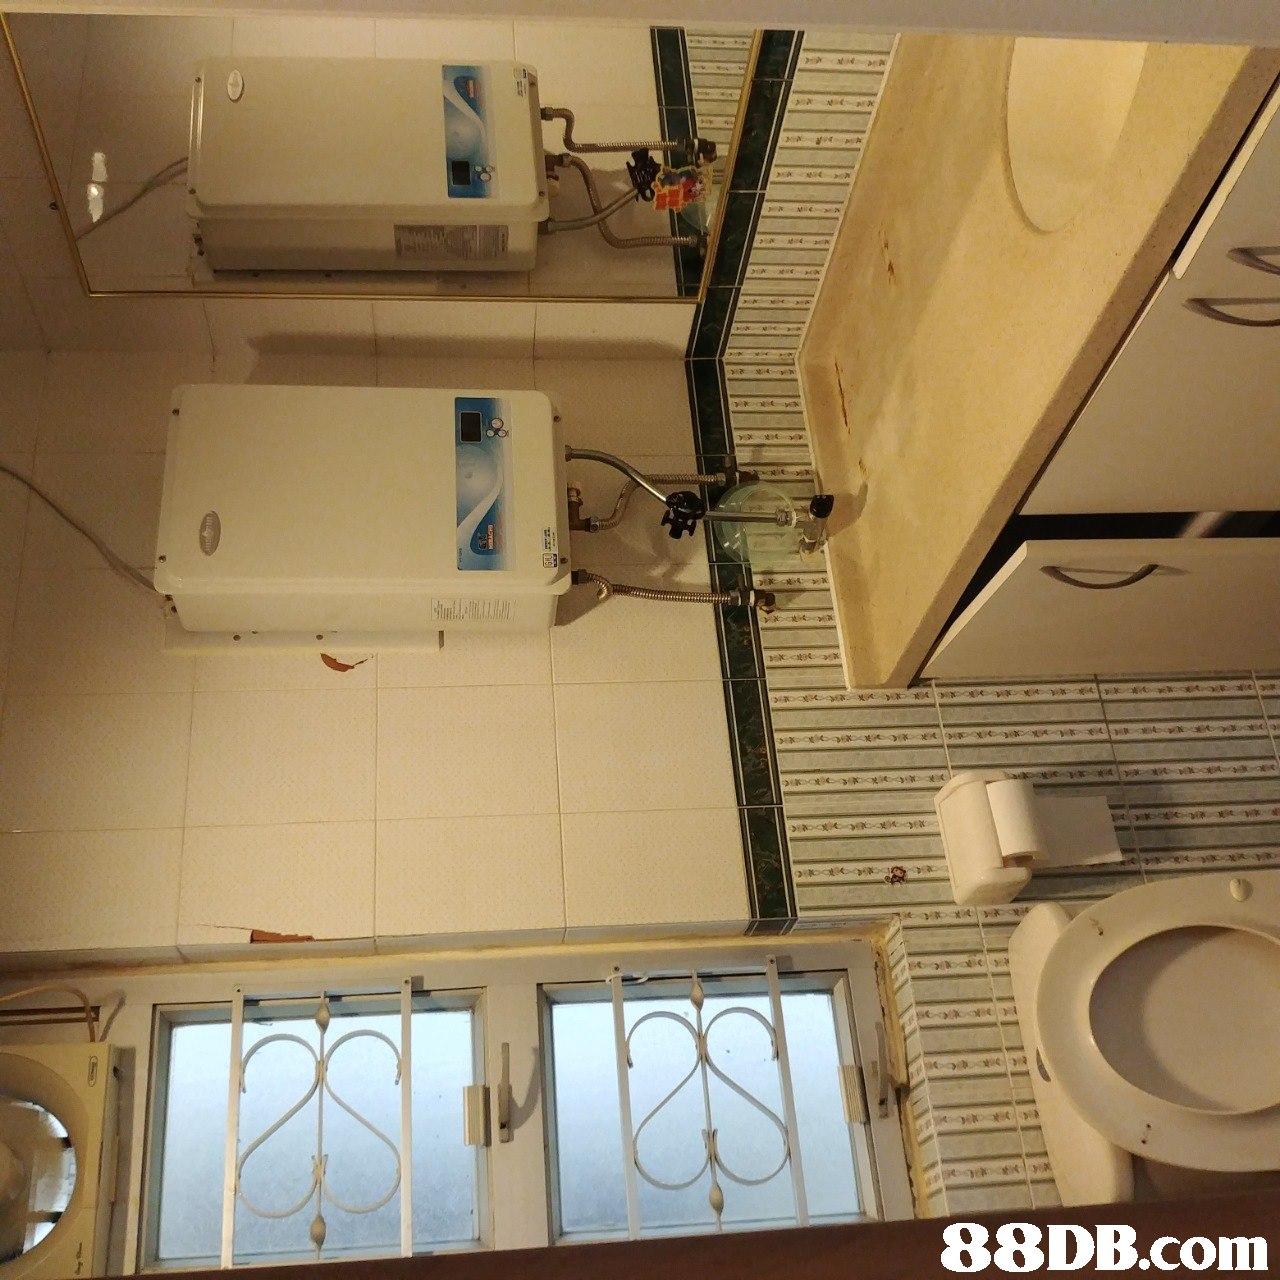 property,room,ceiling,lighting,bathroom